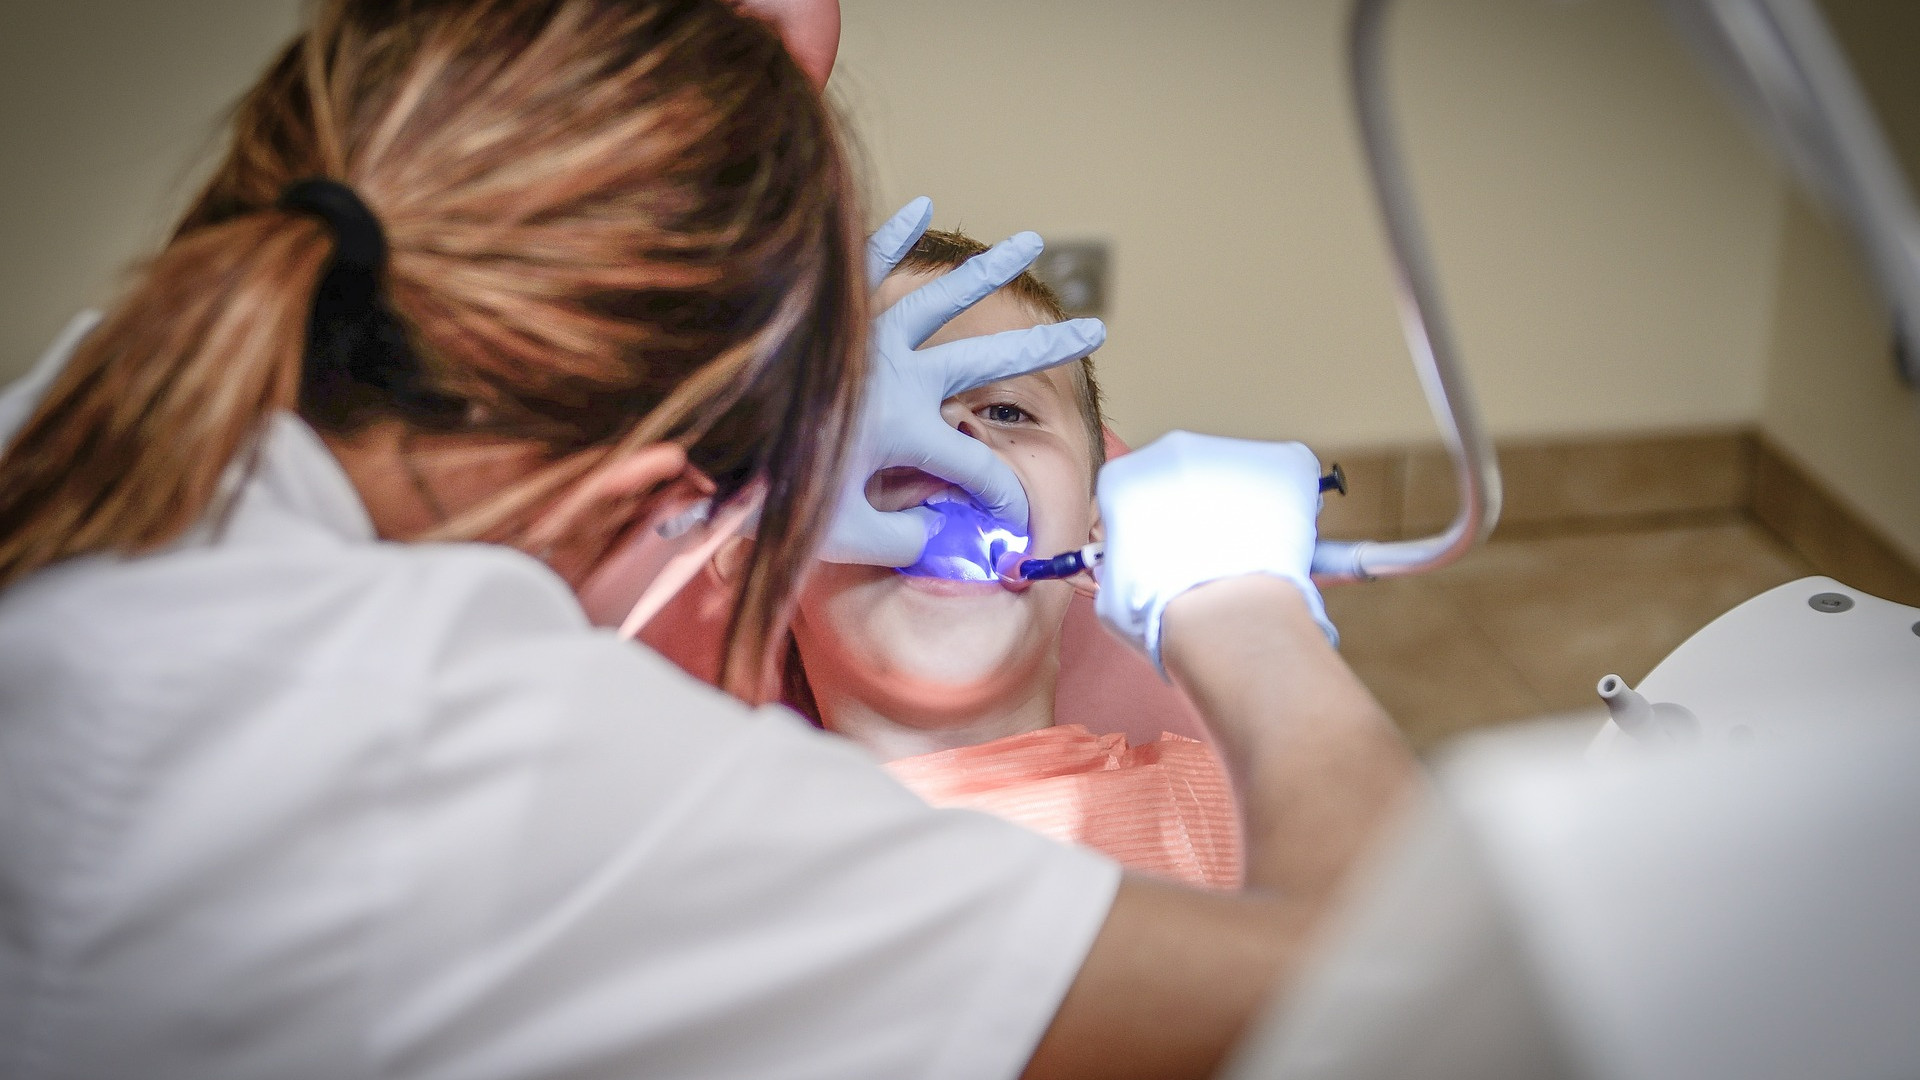 dentist-428649_1920.jpg